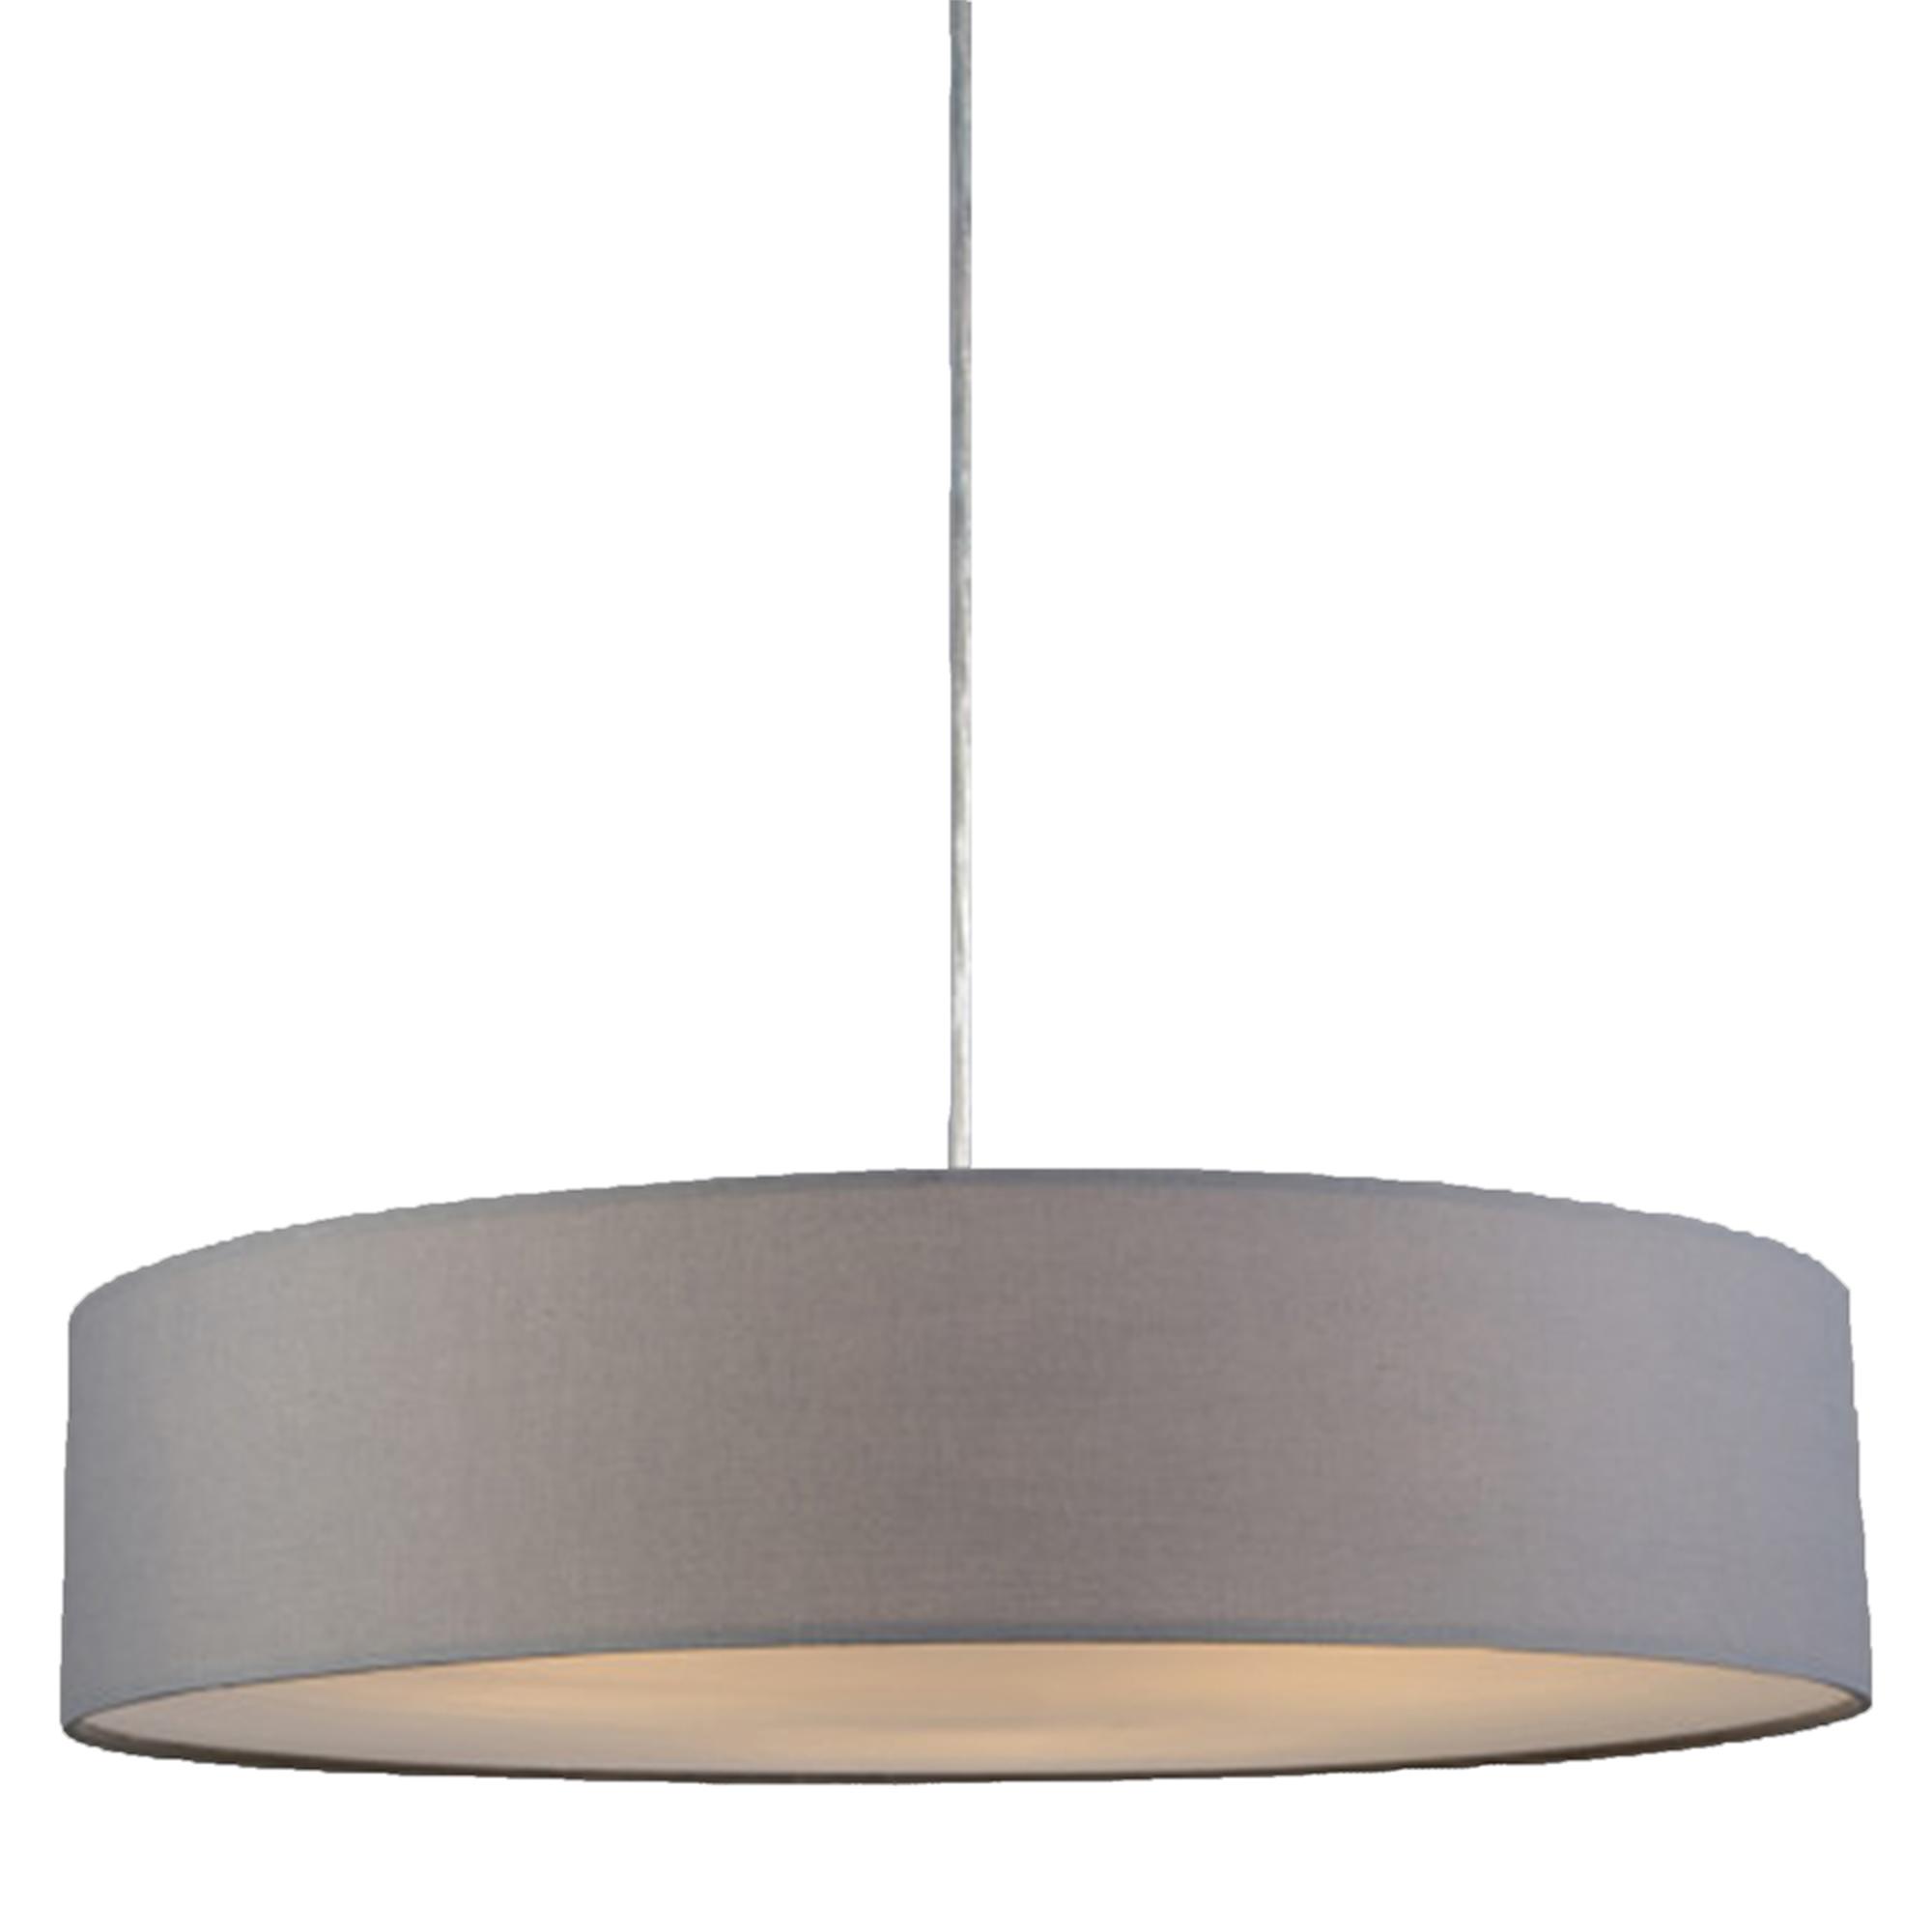 brand new 1eefd ad117 Mara Drum Pendant Light